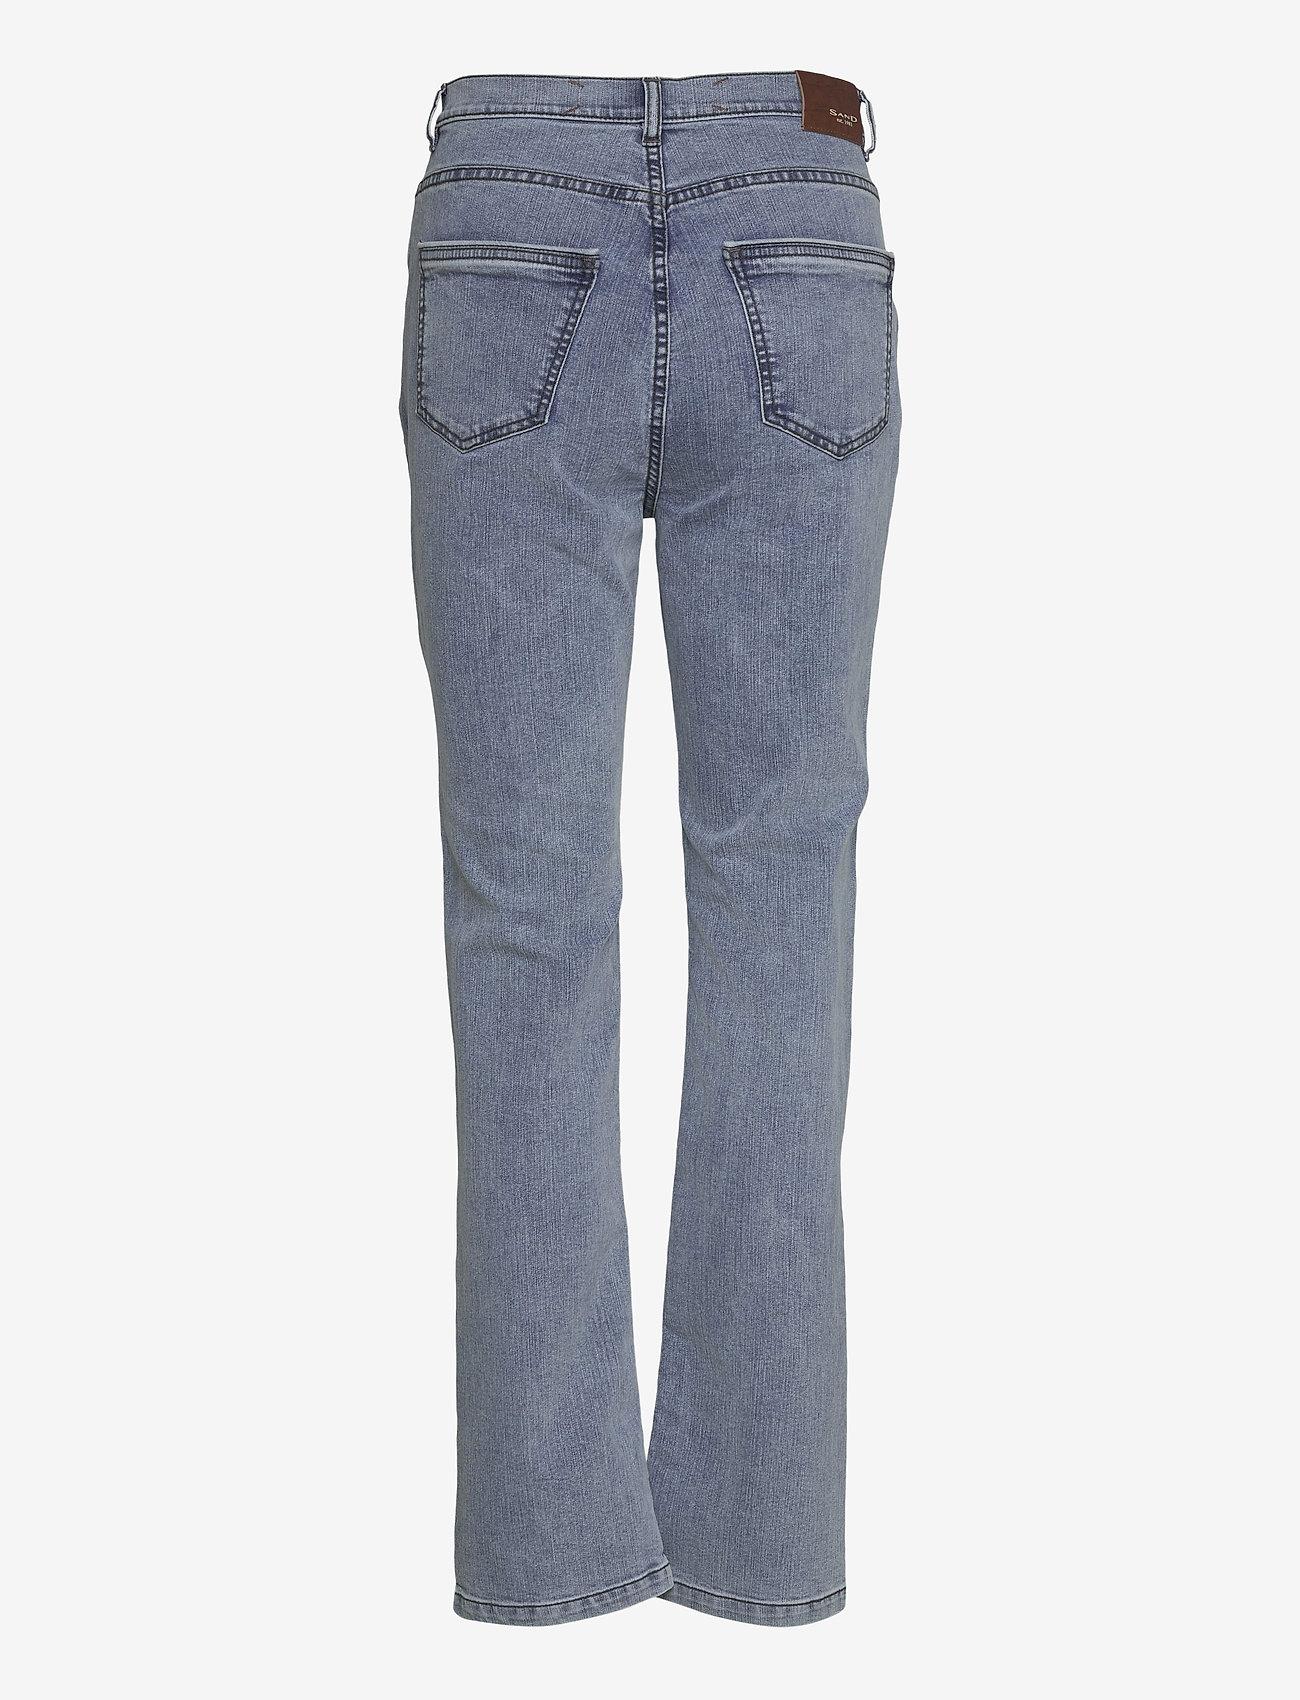 SAND - Original Denim - Kathy - boot cut jeans - pattern - 1